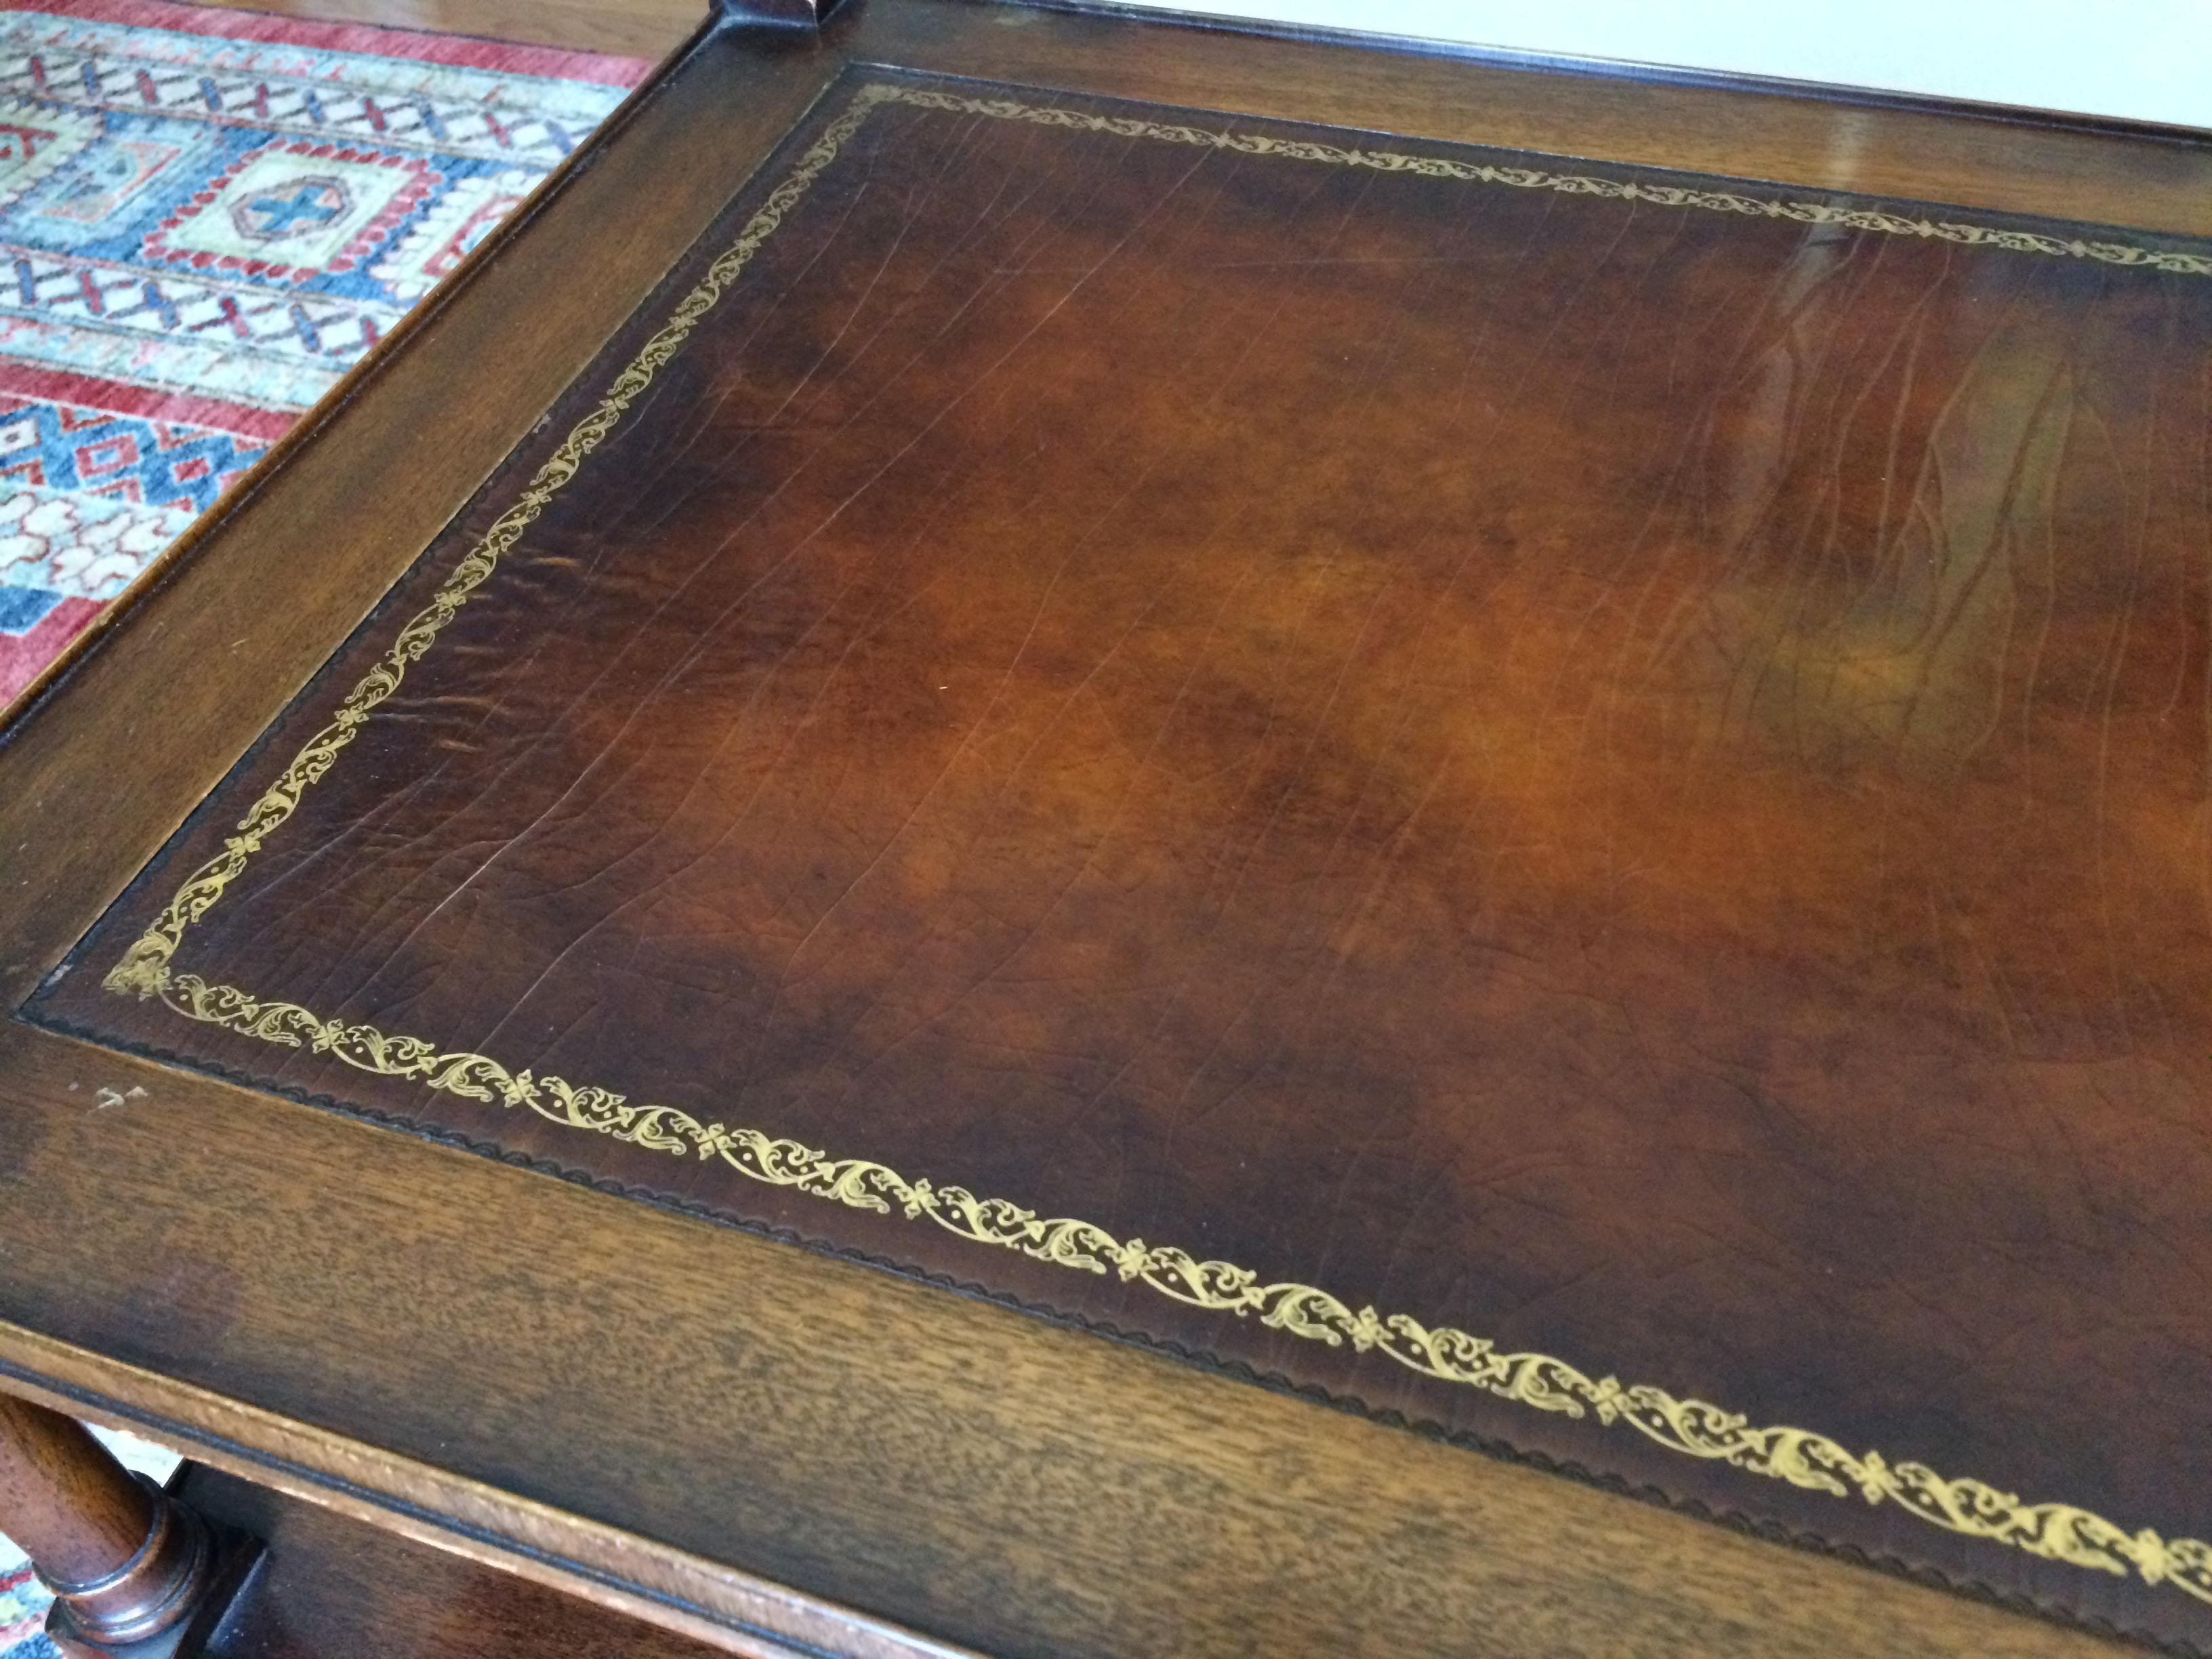 1940s Weiman Heirloom Quality Coffee Table Chairish